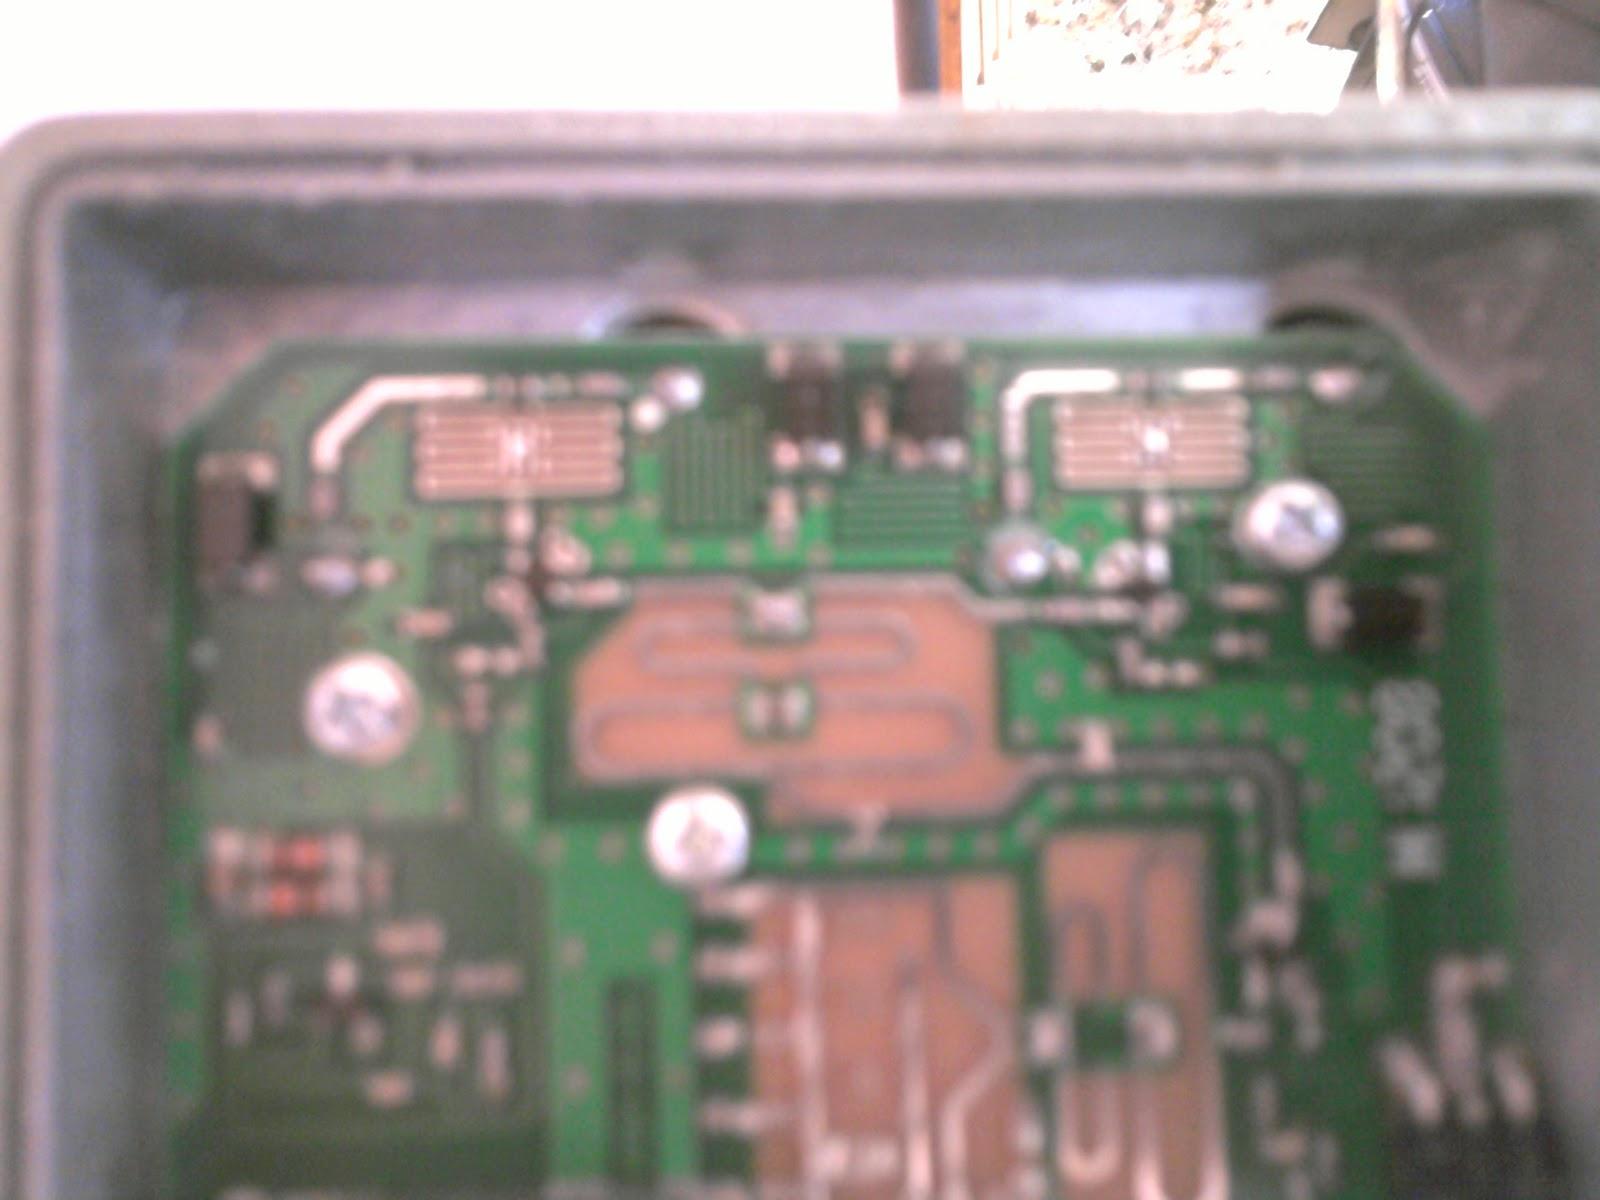 LNB Matrix C-Band Quatro One Cable Solution